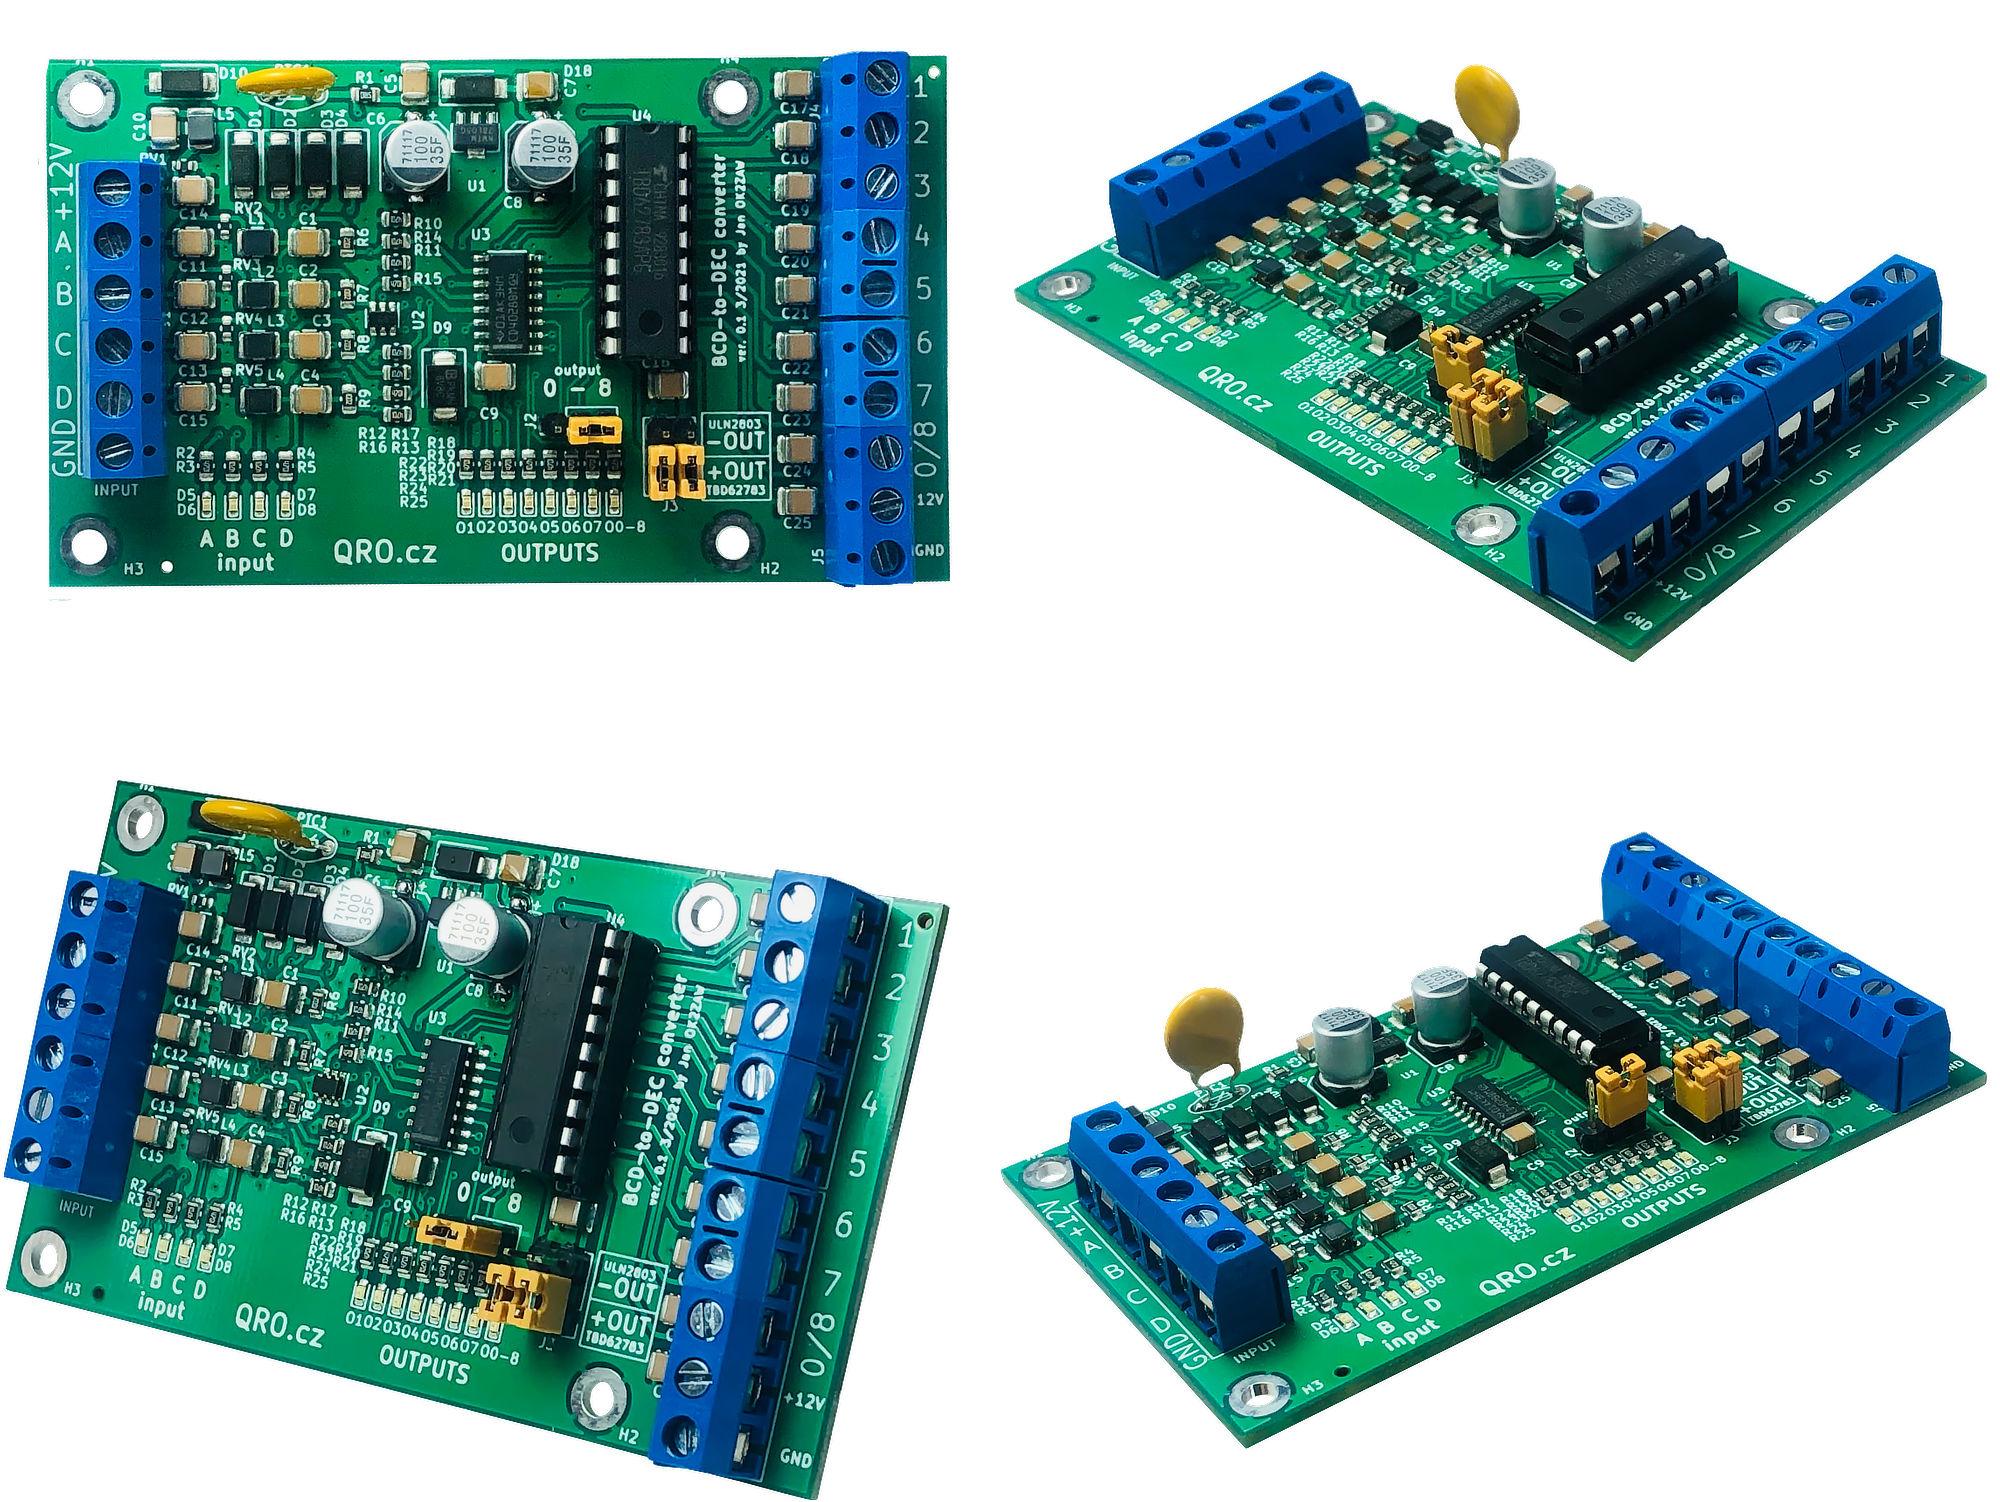 BCD to DEC decoder converter by qro.cz hamparts.shop